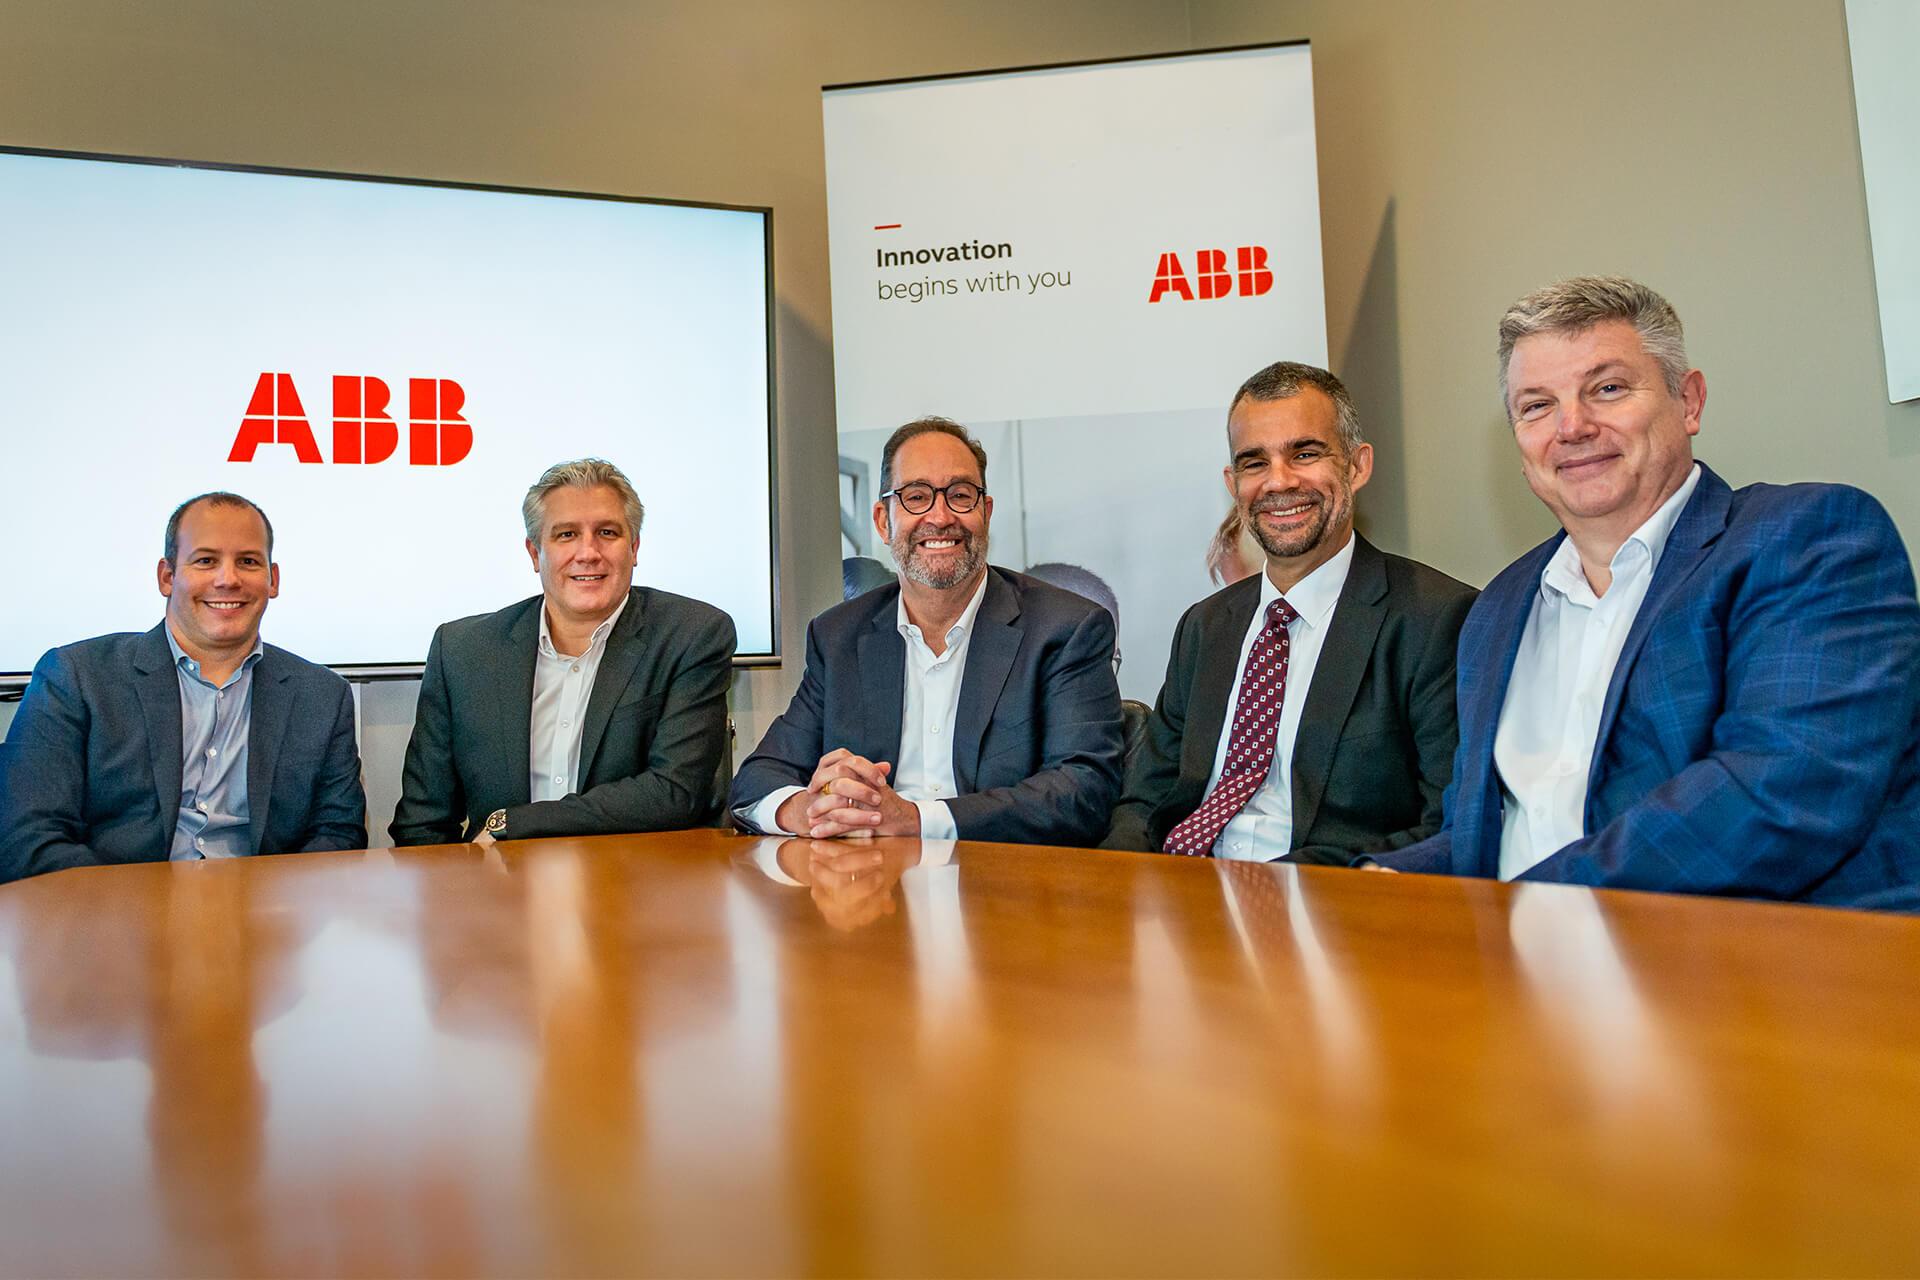 ABB_News Media